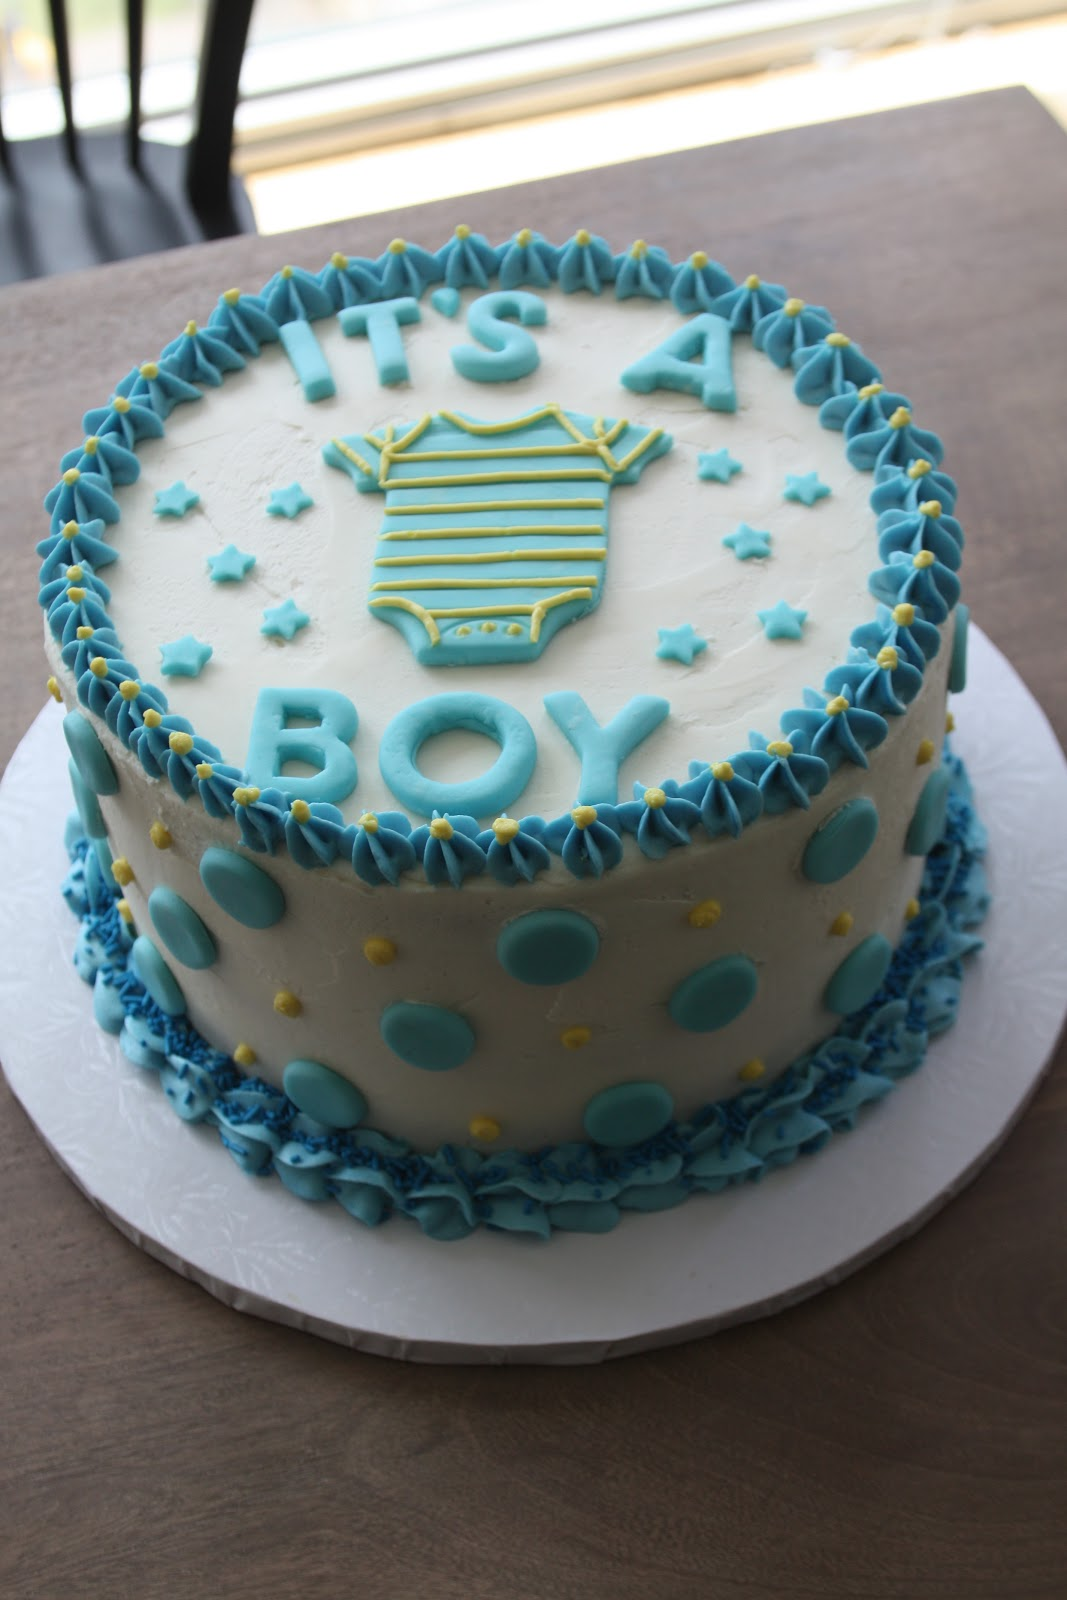 Homemade Boy Baby Shower Cakes